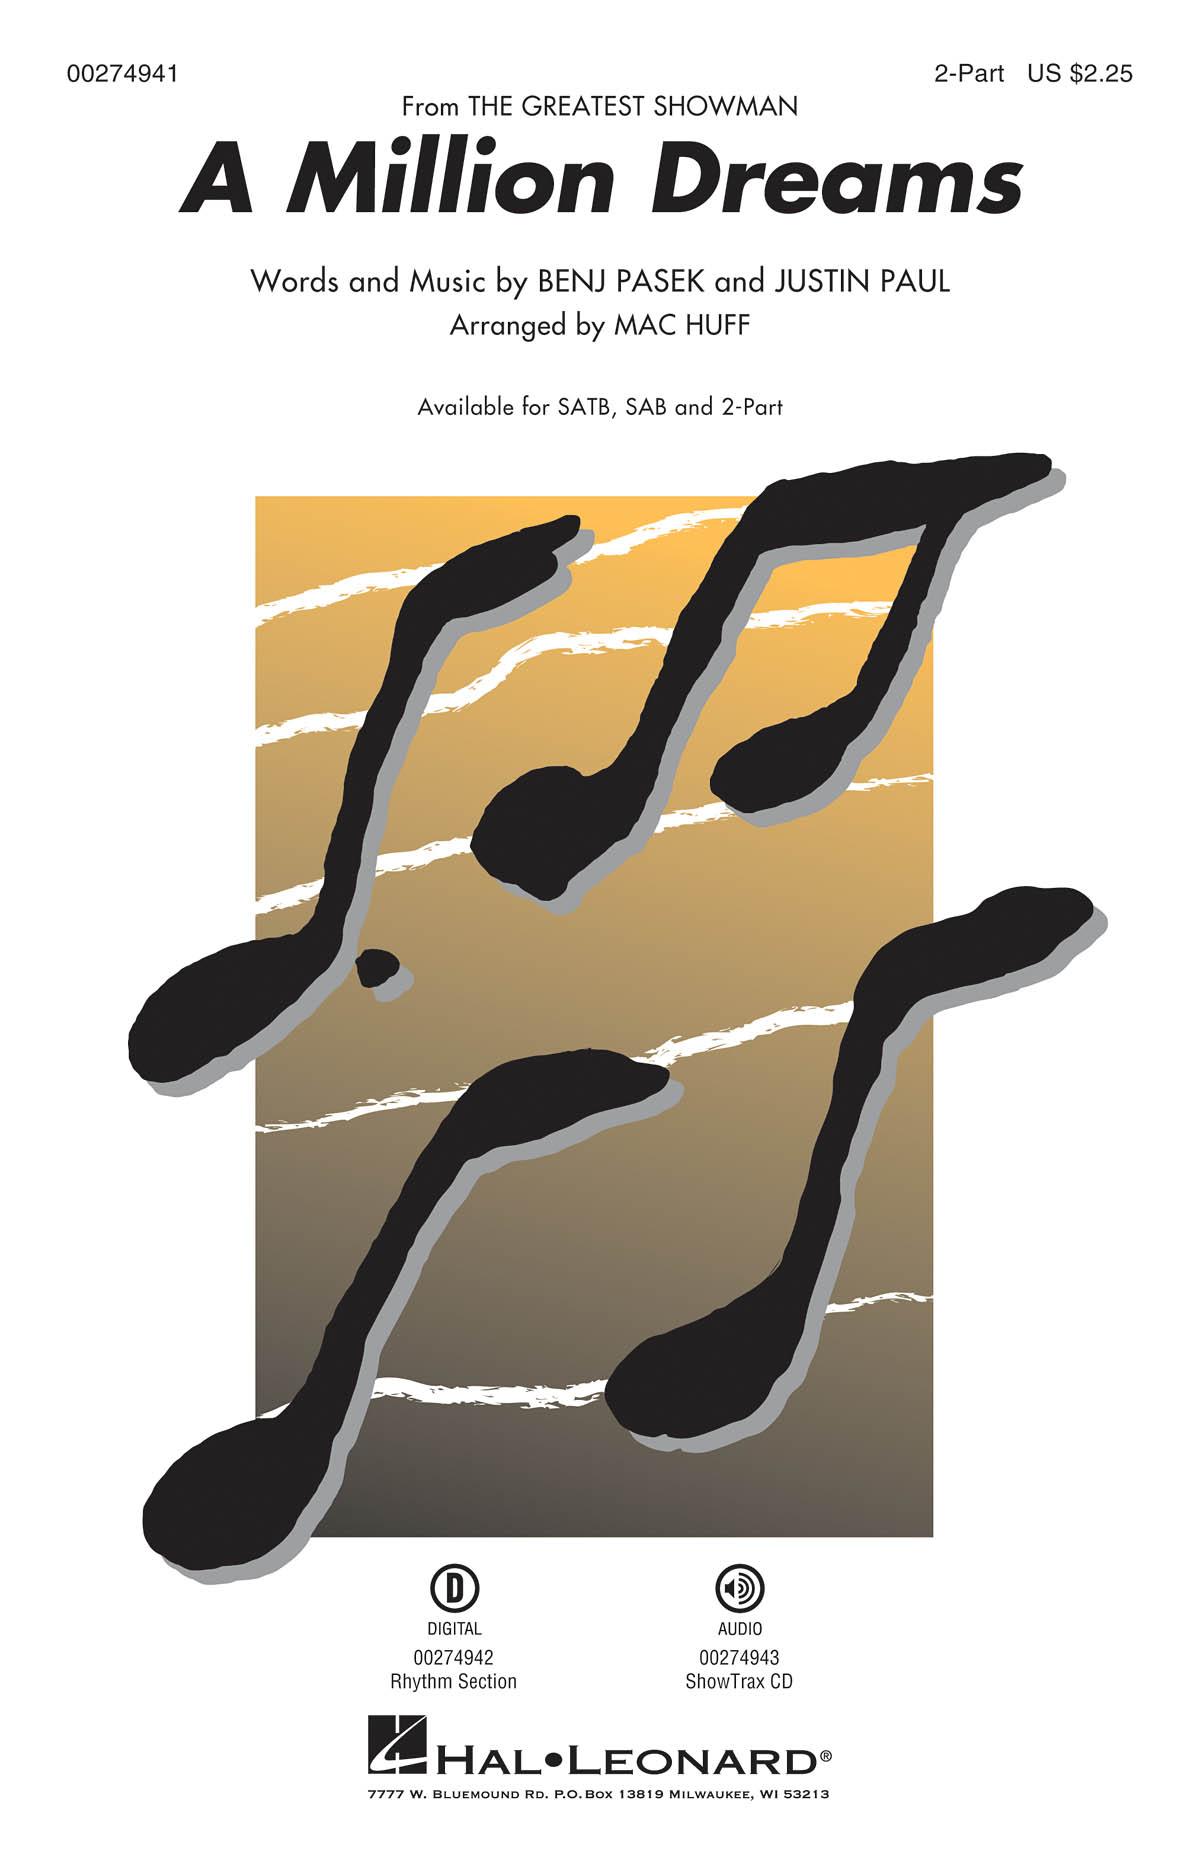 A Million Dreams 'The Greatest Showman' - 2-Part Choir (arr. Huff). Sheet Music  Downloads for 2-Part Choir  Piano Accompaniment